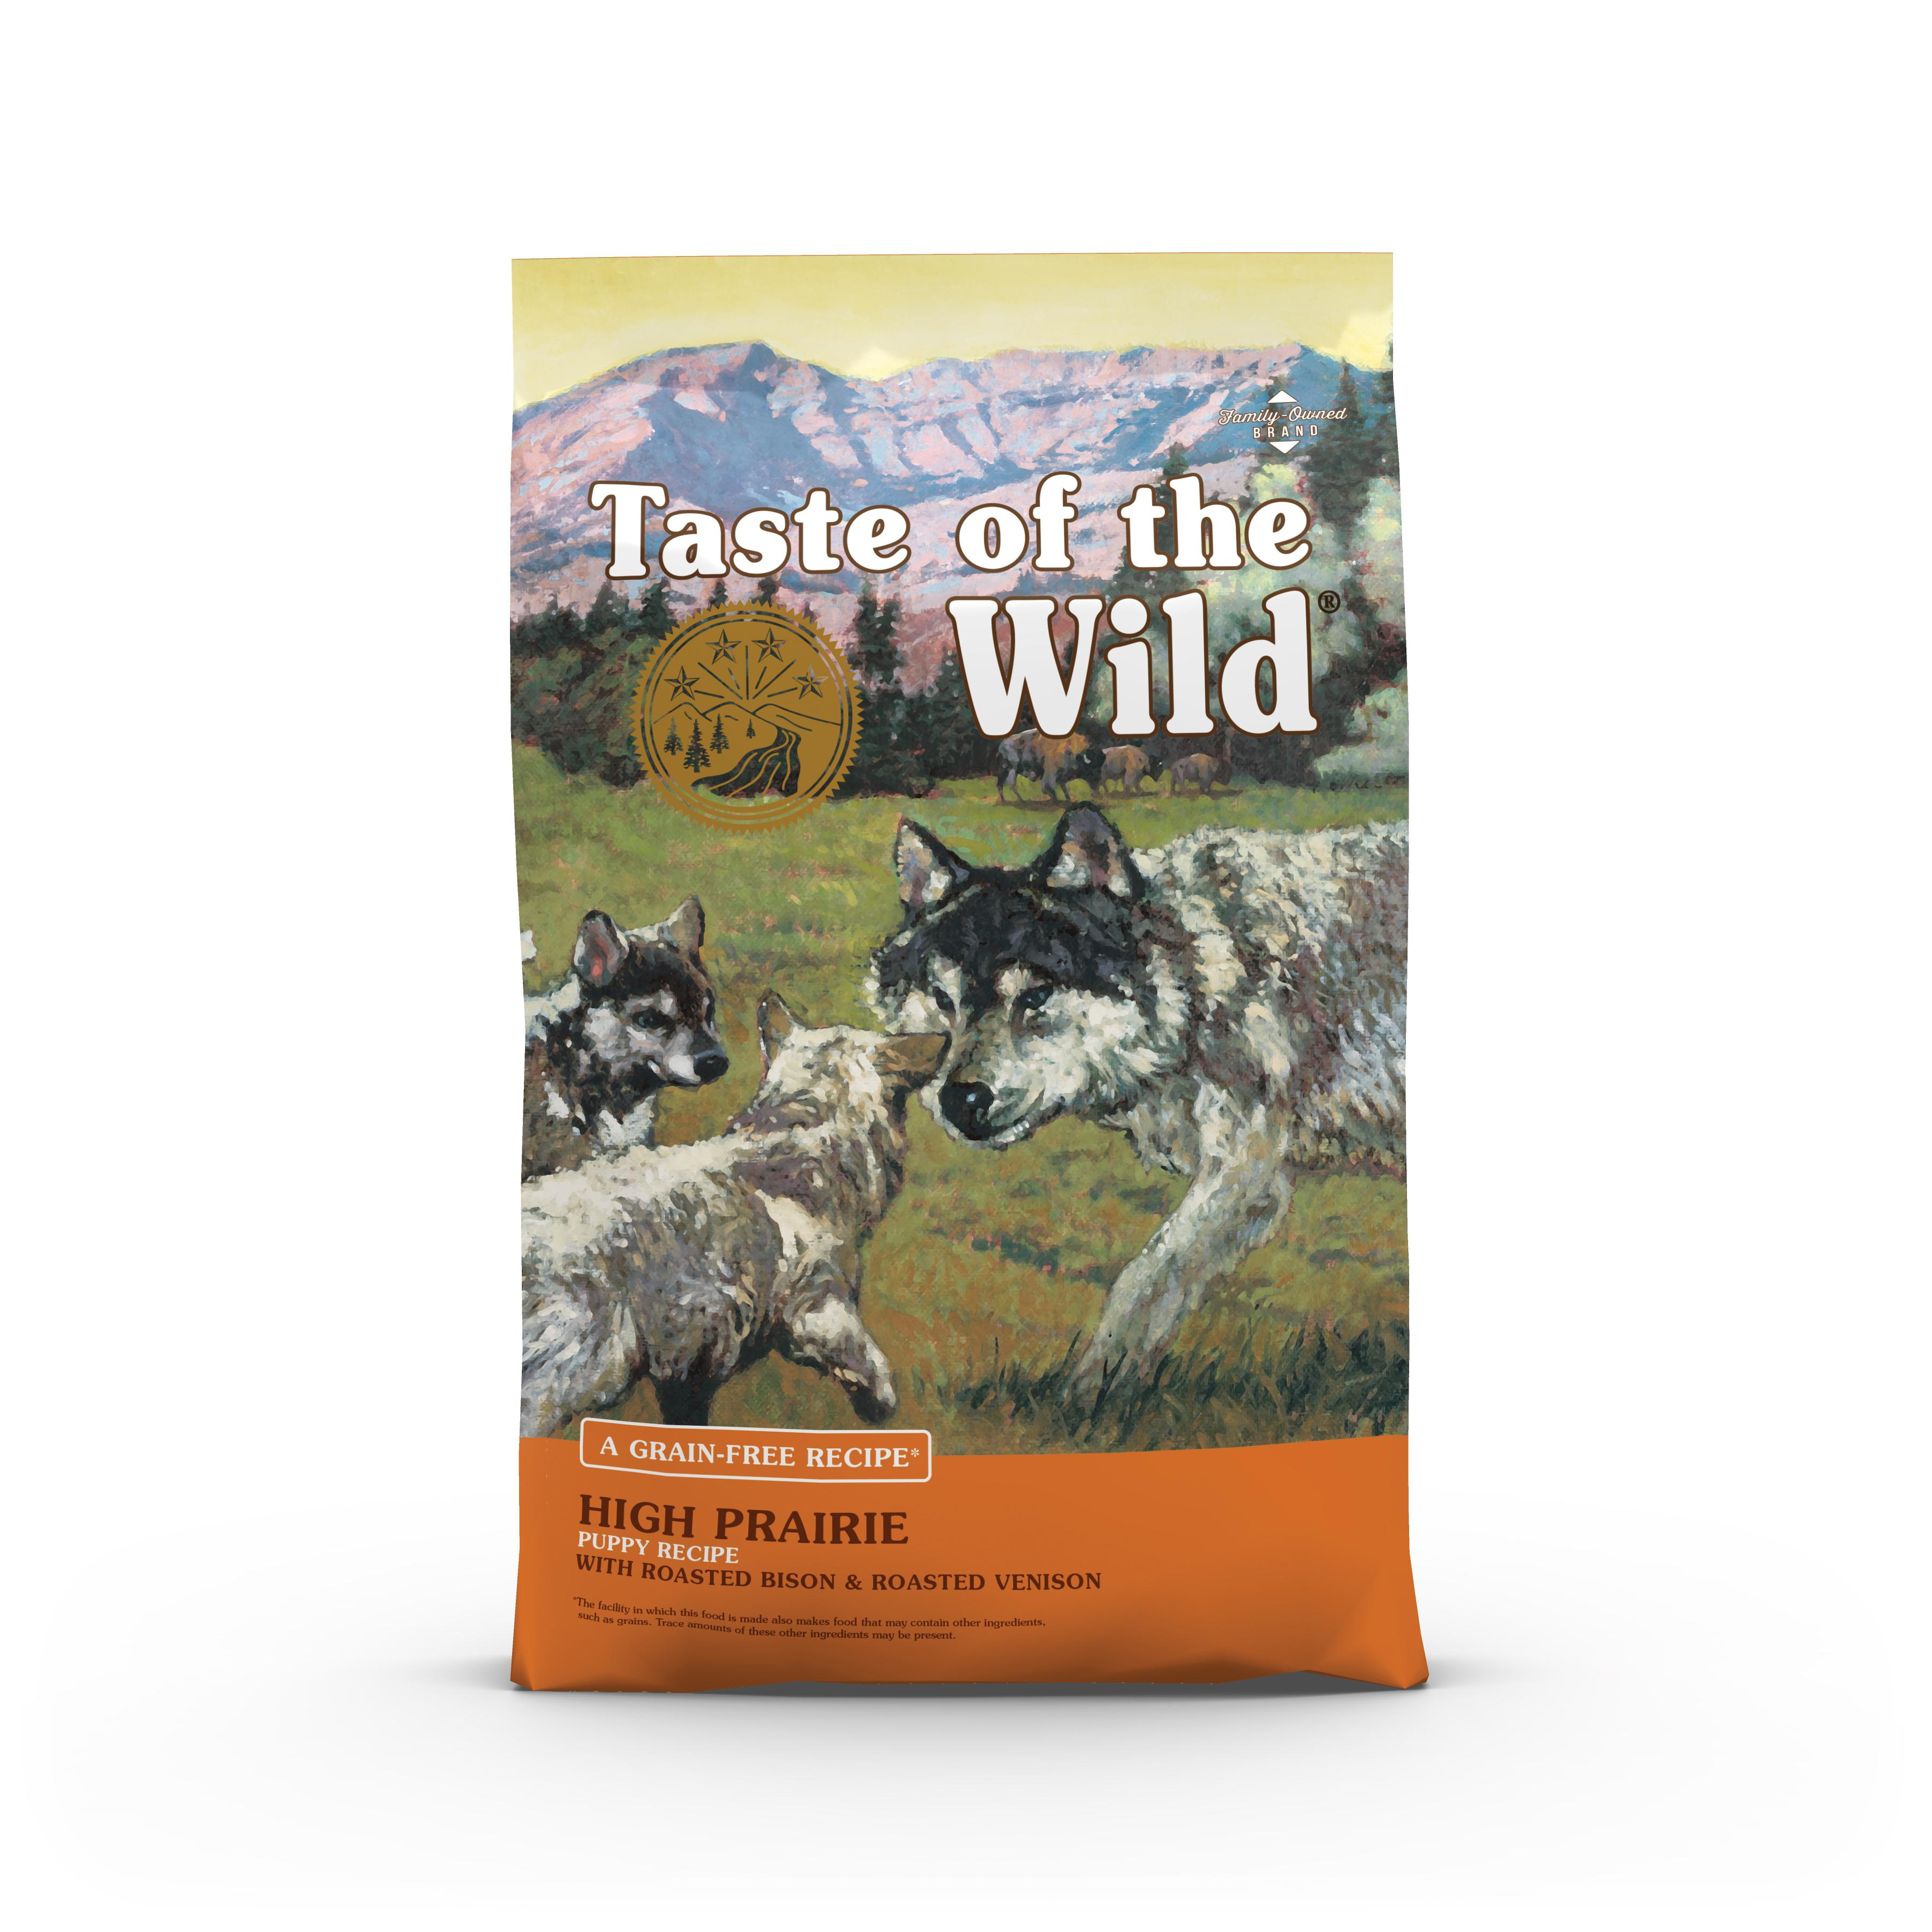 Taste of the Wild High Prairie Puppy Formula Grain-Free Dry Dog Food, 14-lb